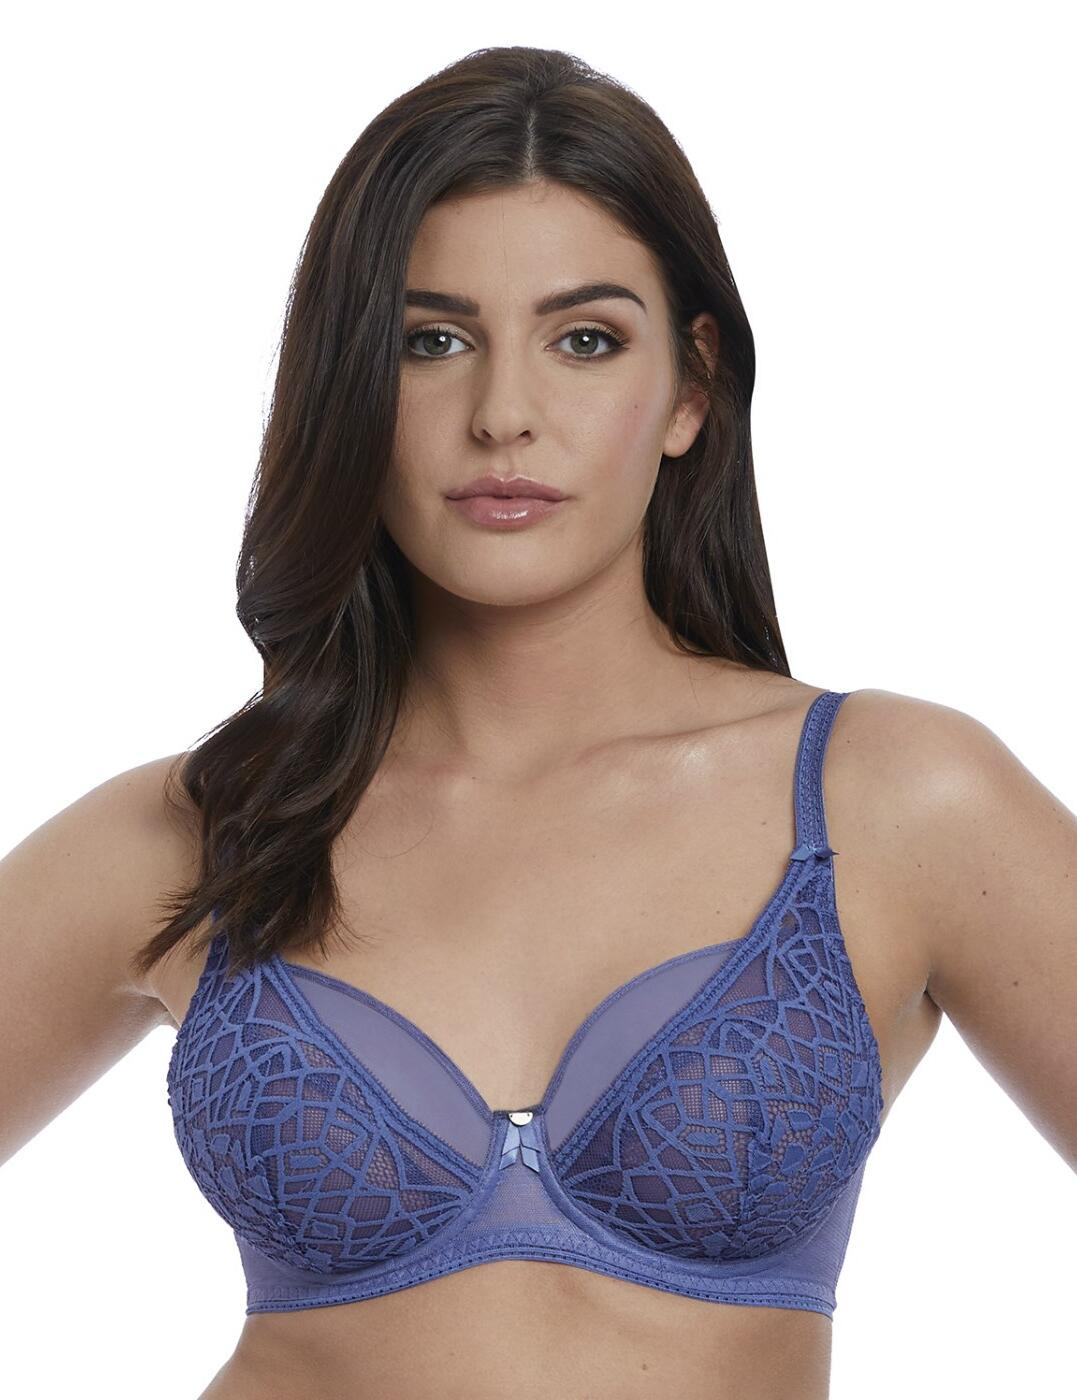 5011 Freya Soiree Lace High Apex Bra  - 5011 Denim